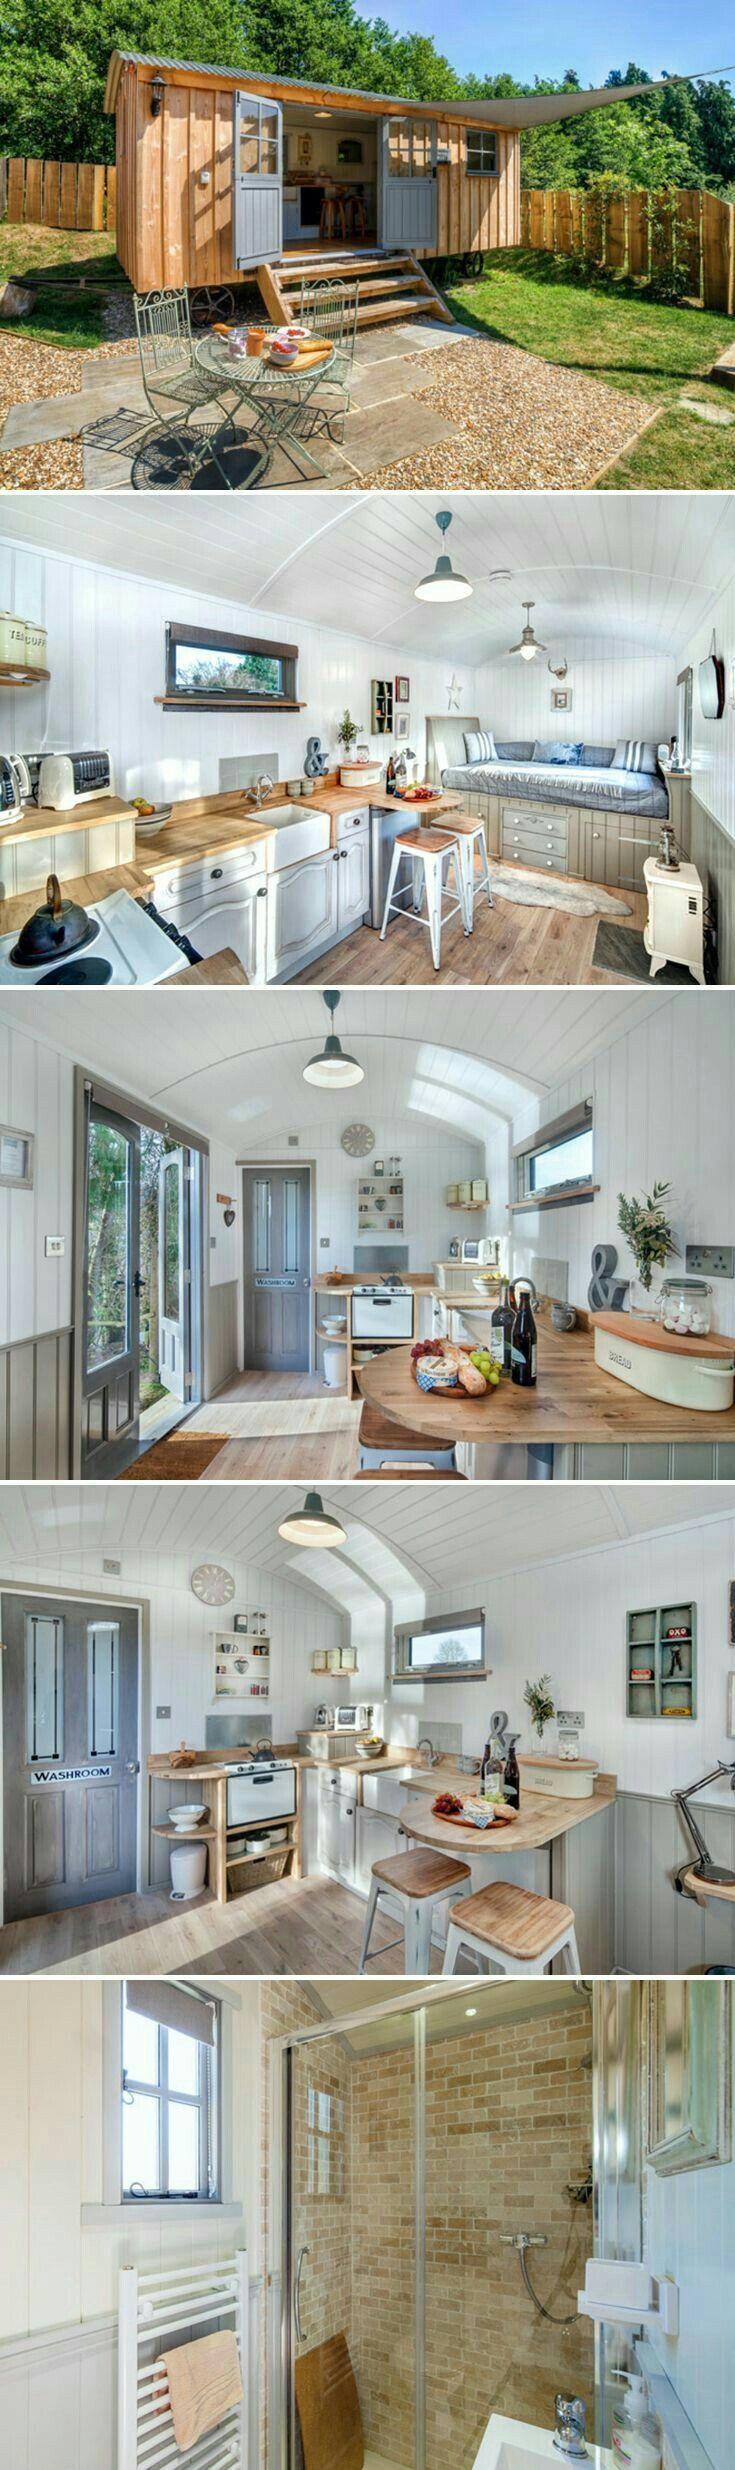 Home design ideas decorating modern guest house also tiny movement rh pinterest